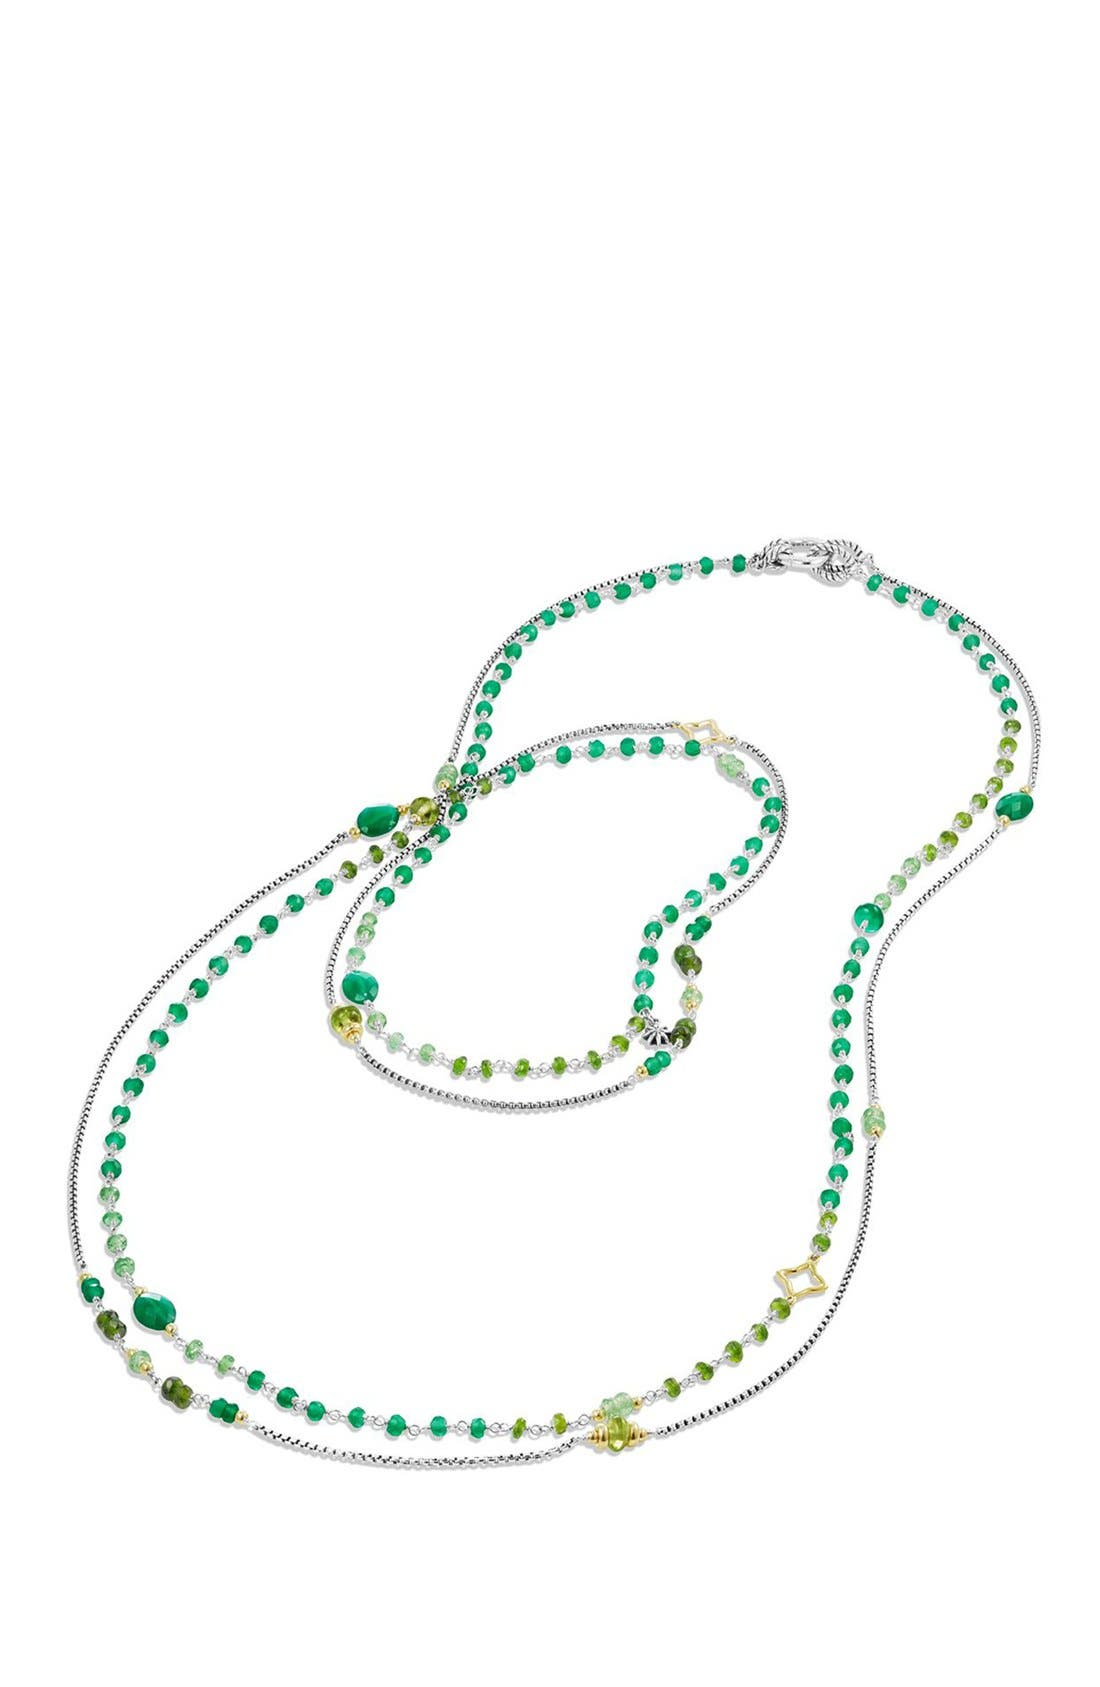 David Yurman 'Bead and Chain' Bead Necklace with Carnelian, Garnet & 18K Gold